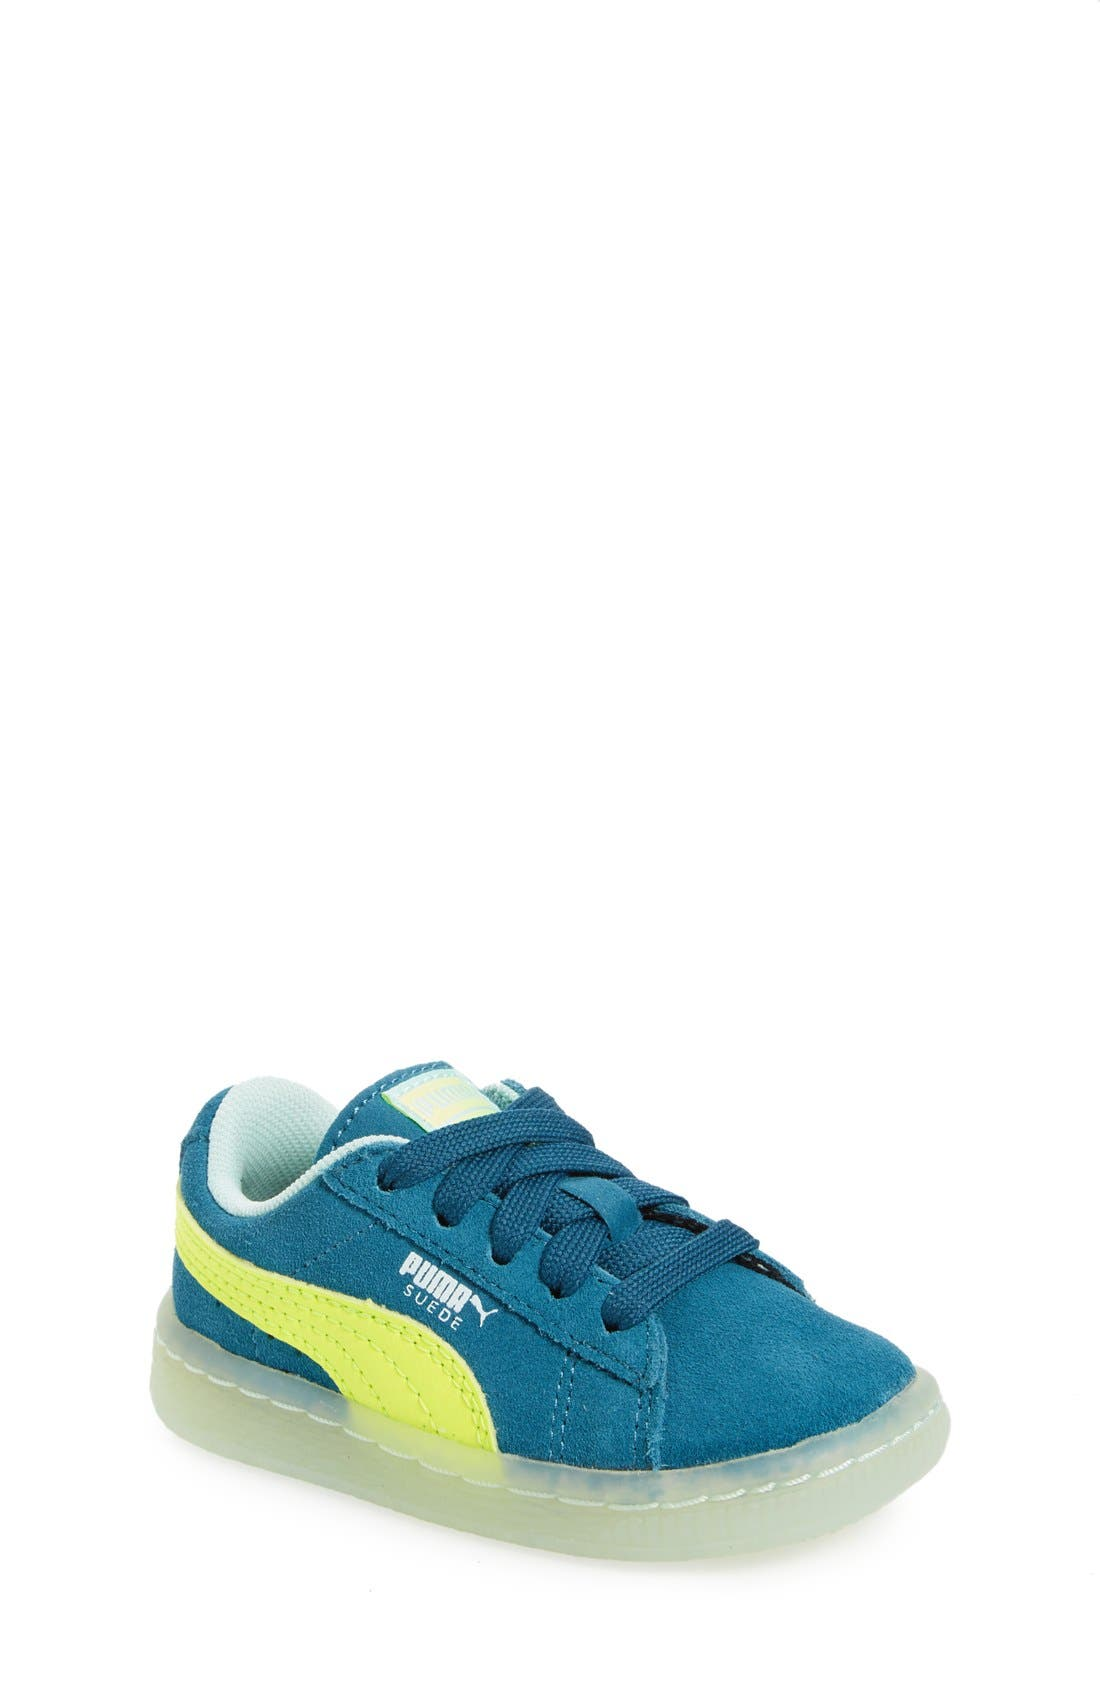 PUMA Iced Sneaker